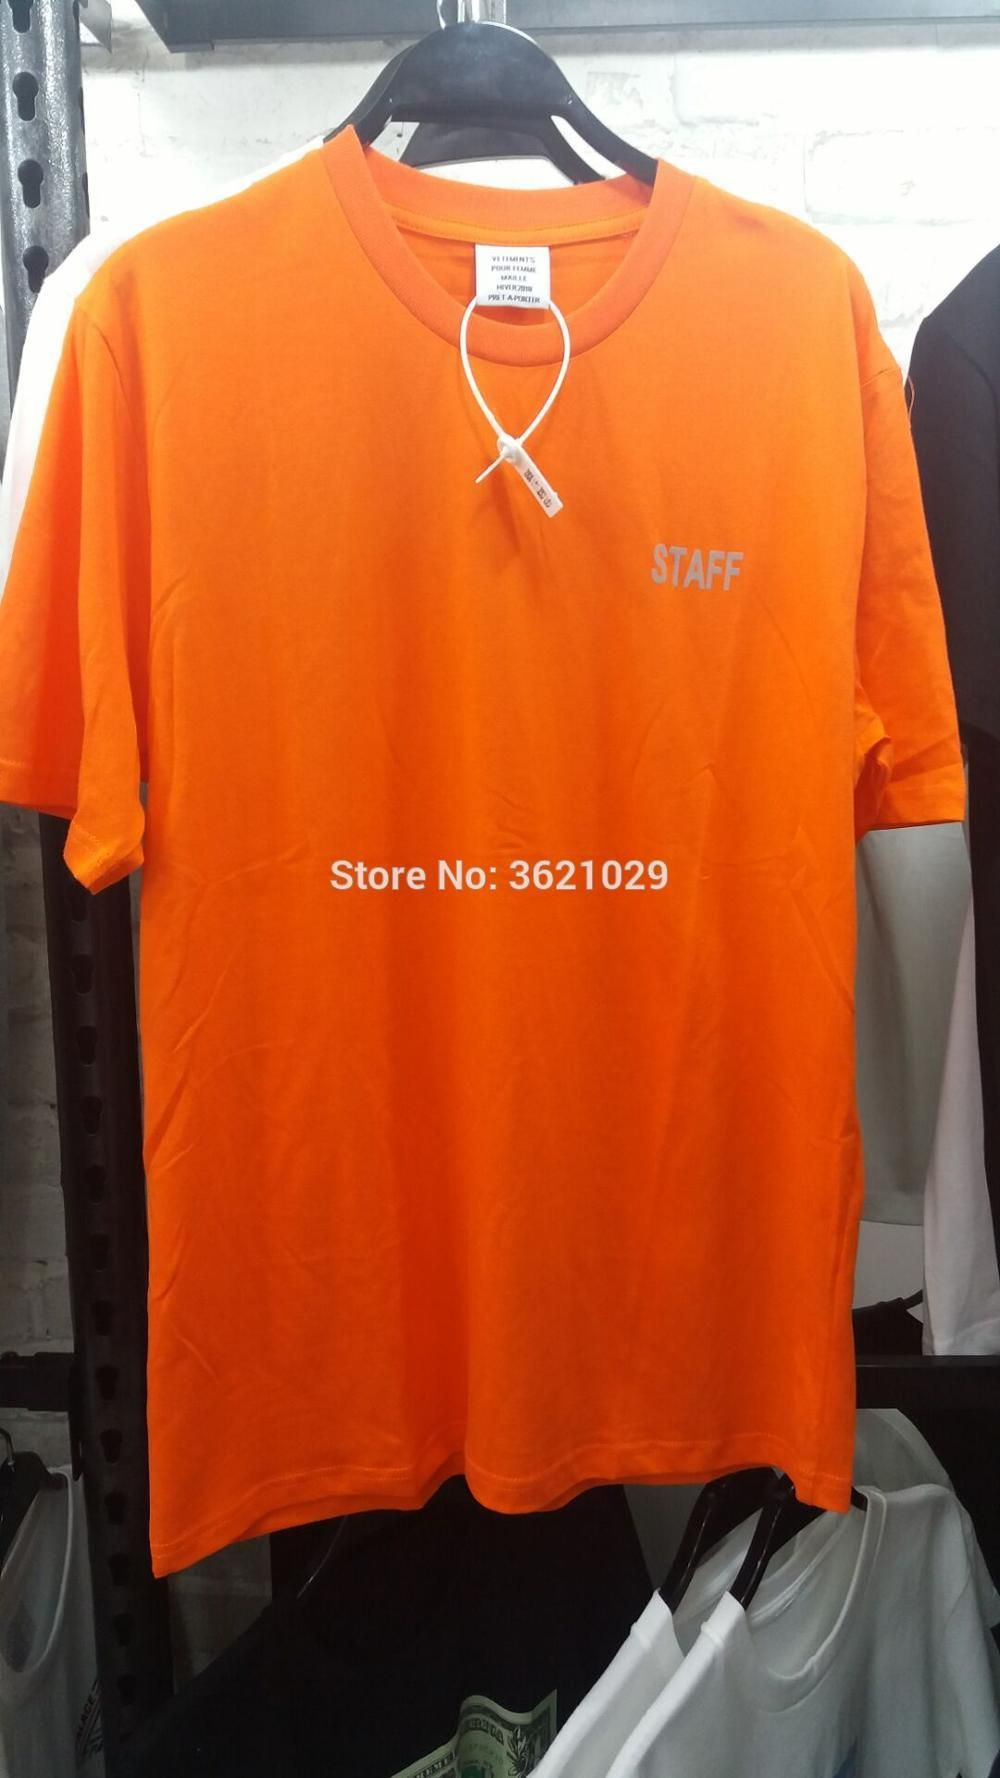 c056baf8d324 2018 F/W Summer STAFF VETEMENTS Orange reflective Letter Embroidery men  short sleeve t shirt